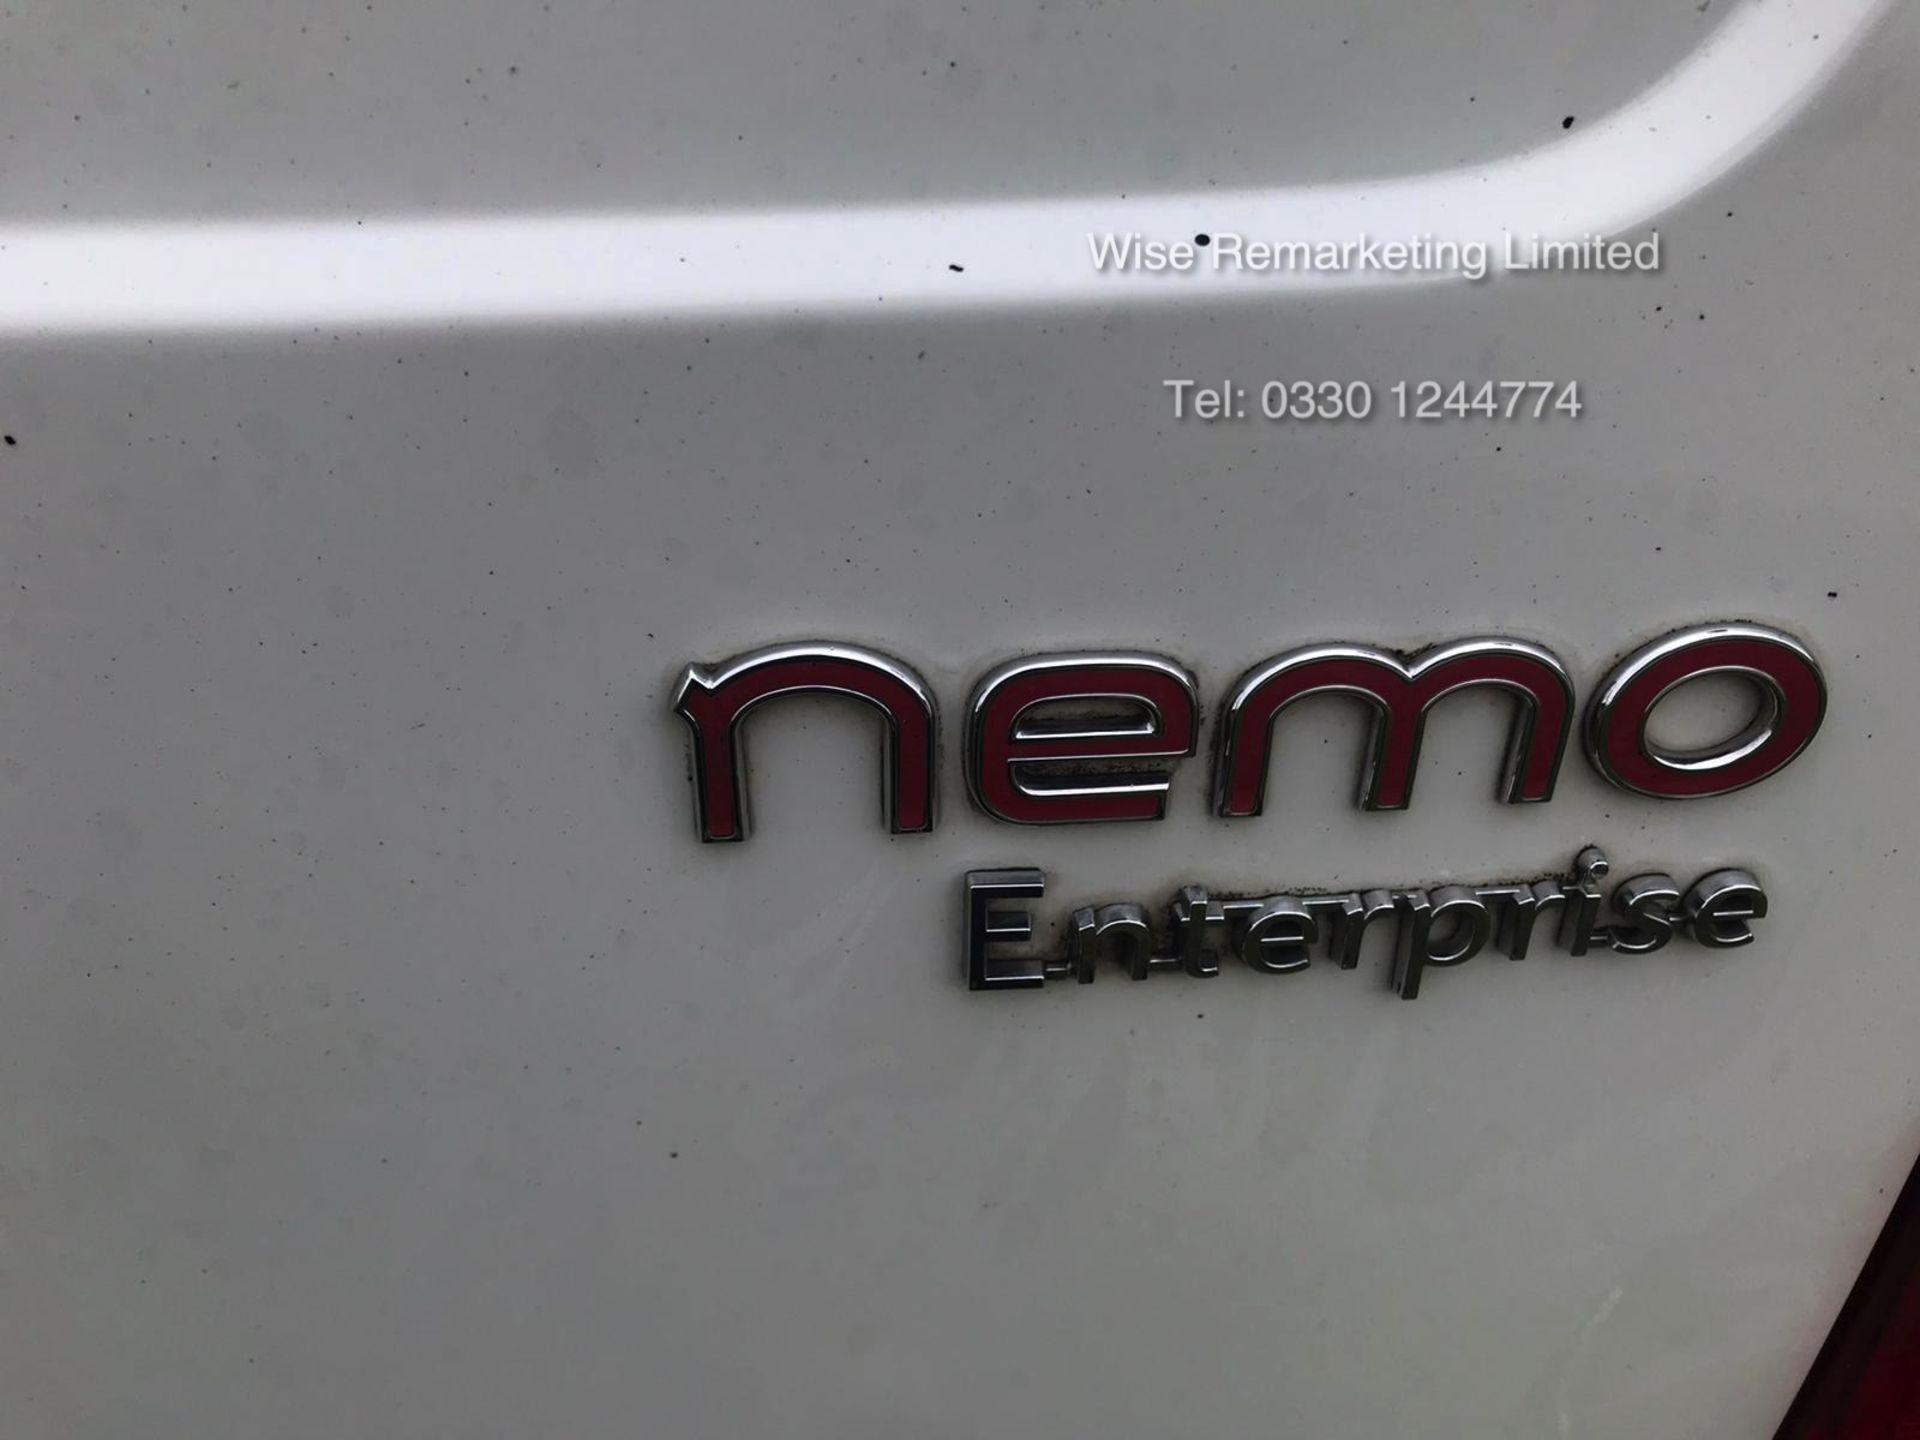 Lot 42 - Citroen Nemo 660 Enterprise 1.3 DHi - 2014 14 Reg - 1 Owner From New - Air Con